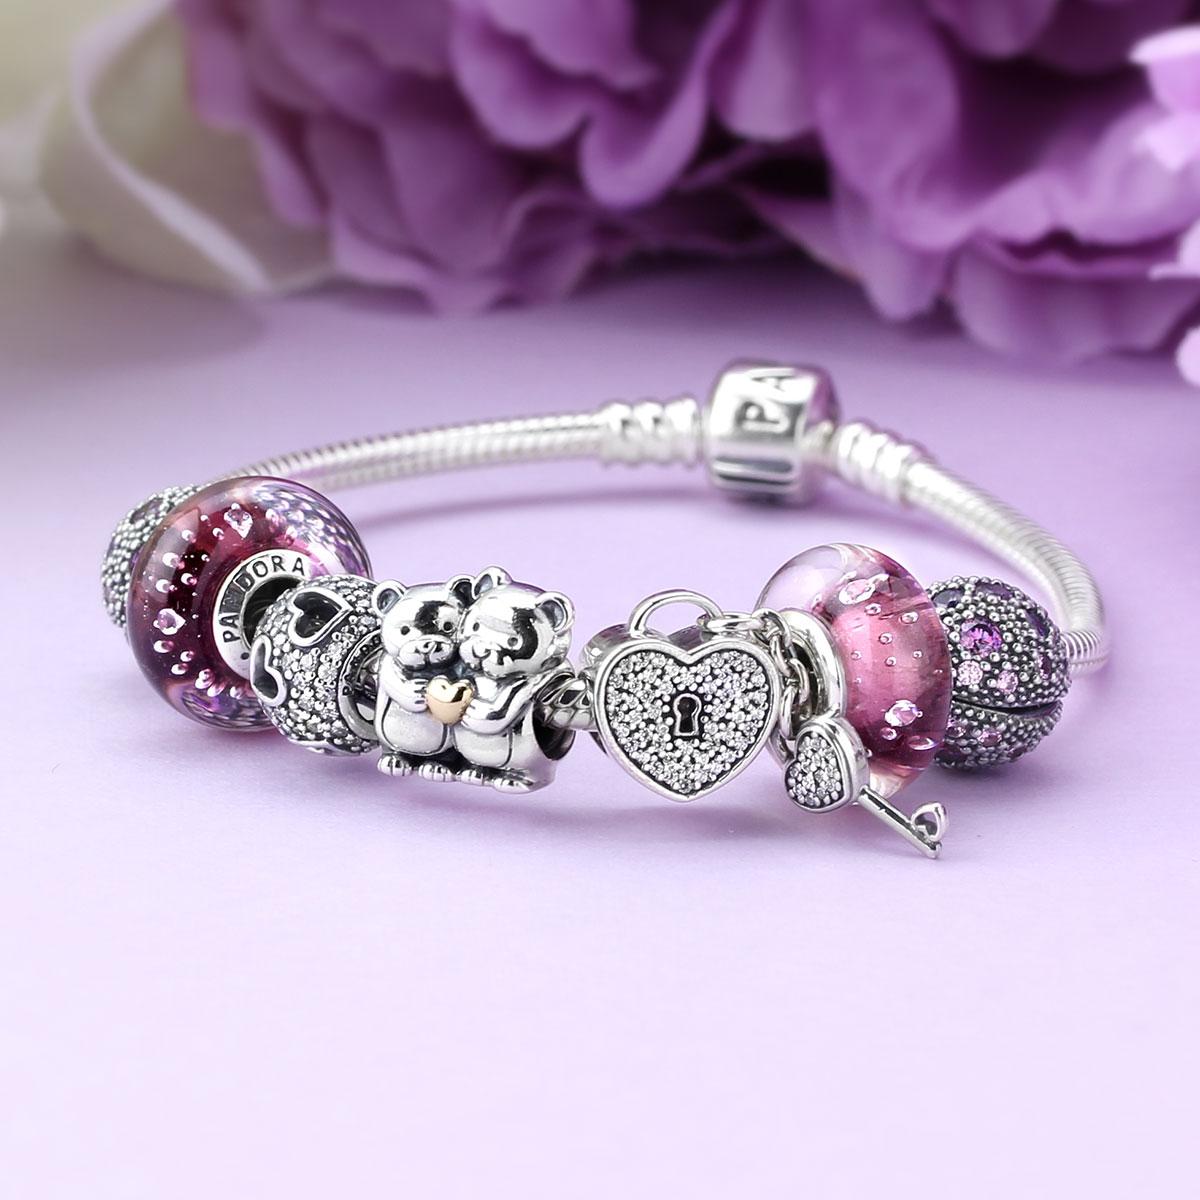 Charm Bracelet Ideas: Finished Pandora Bracelet